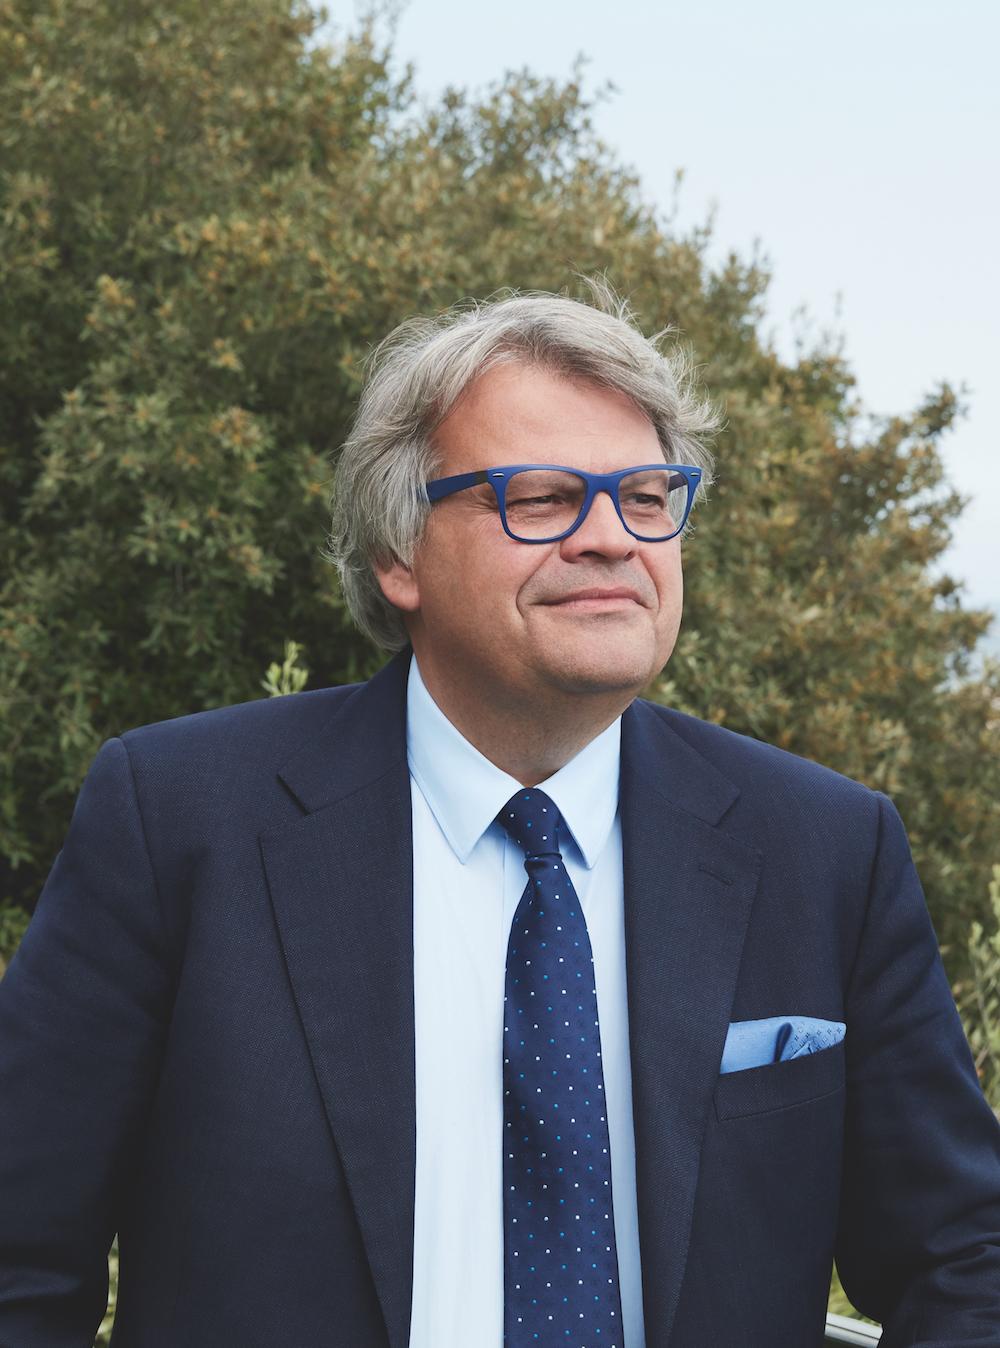 LV perfumer - Jacques Cavallier Belletrud